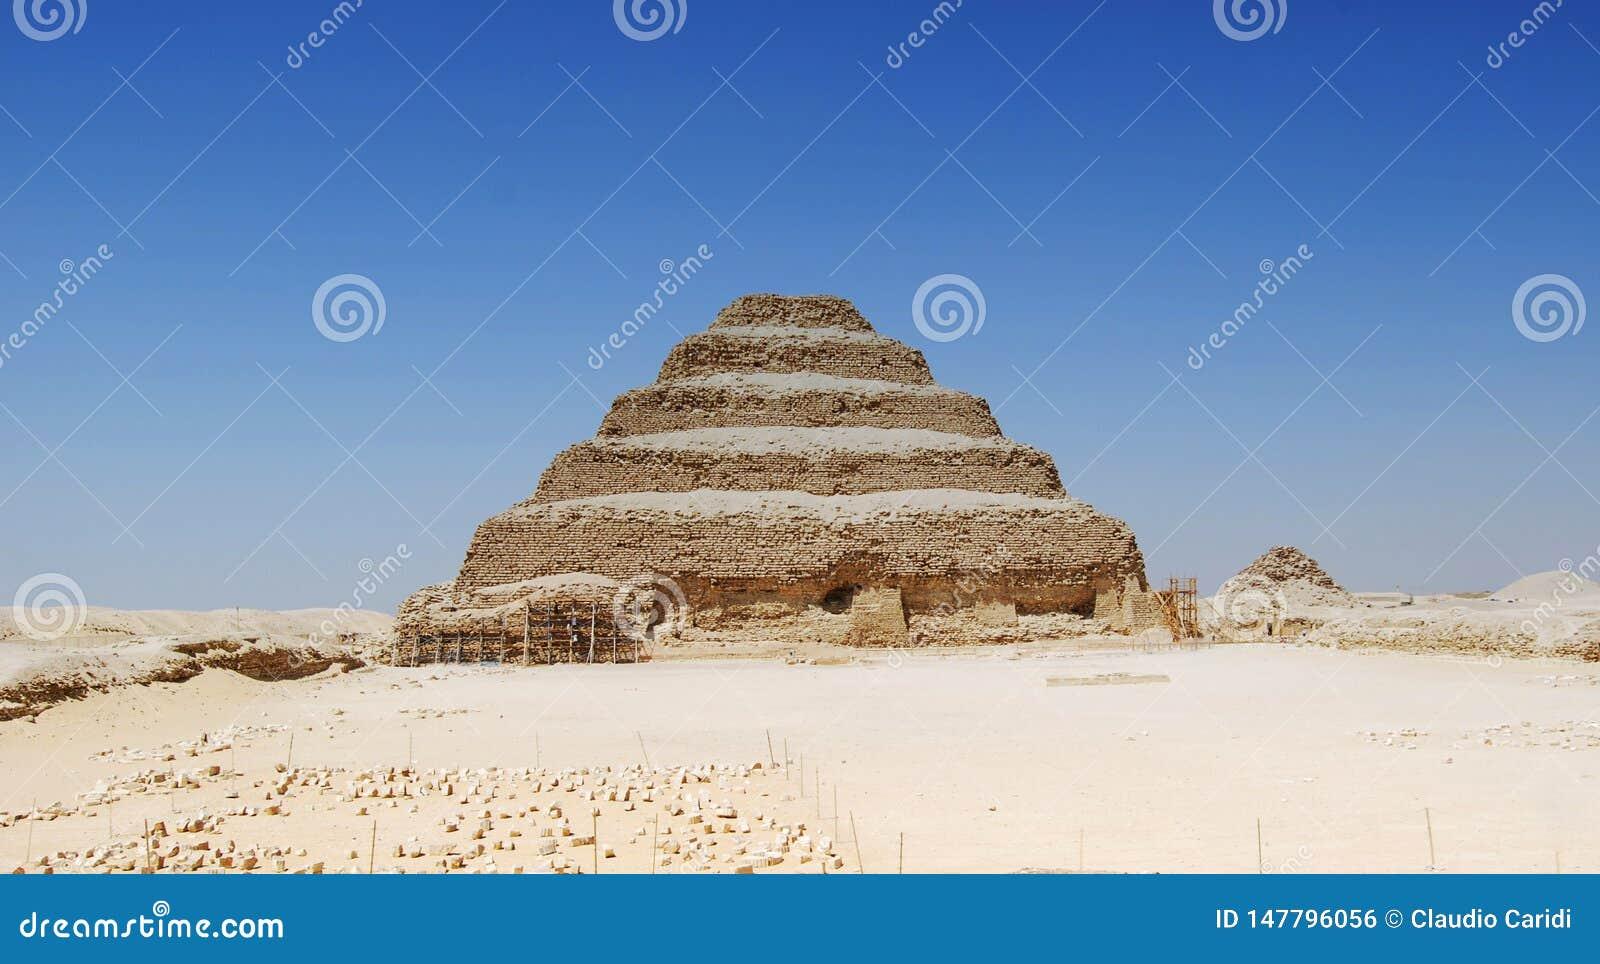 Panorama view of the pyramid of Saqqara, Egypt